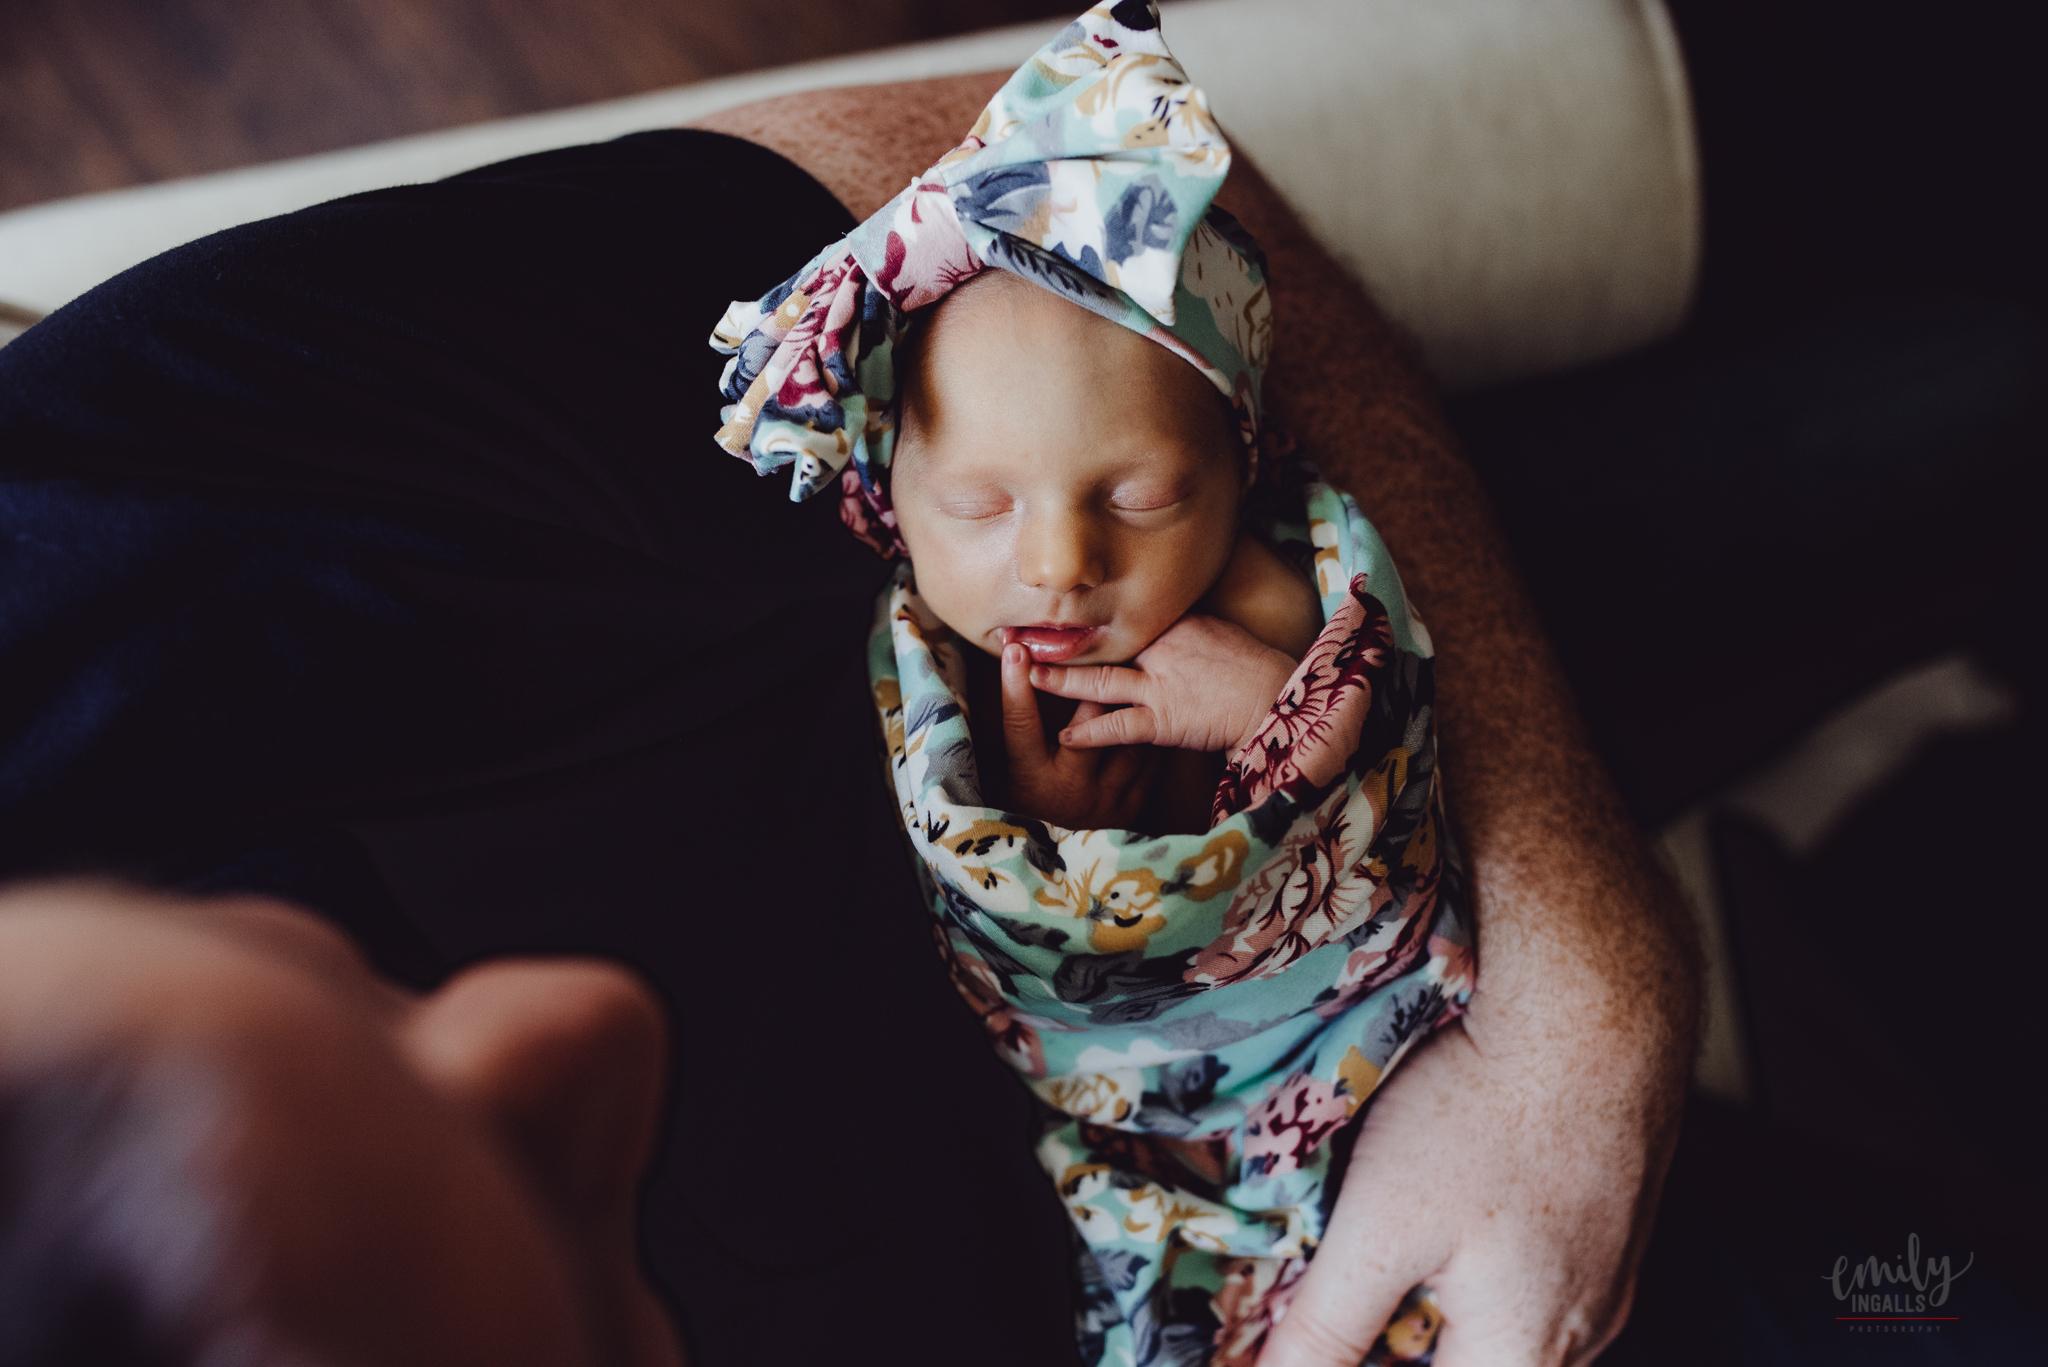 Newborn Photographer_Round Rock Newborn Photographer_Emily Ingalls Photography_Austin Photographer_Pflugerville Photographer_Family Photographer-17.jpg